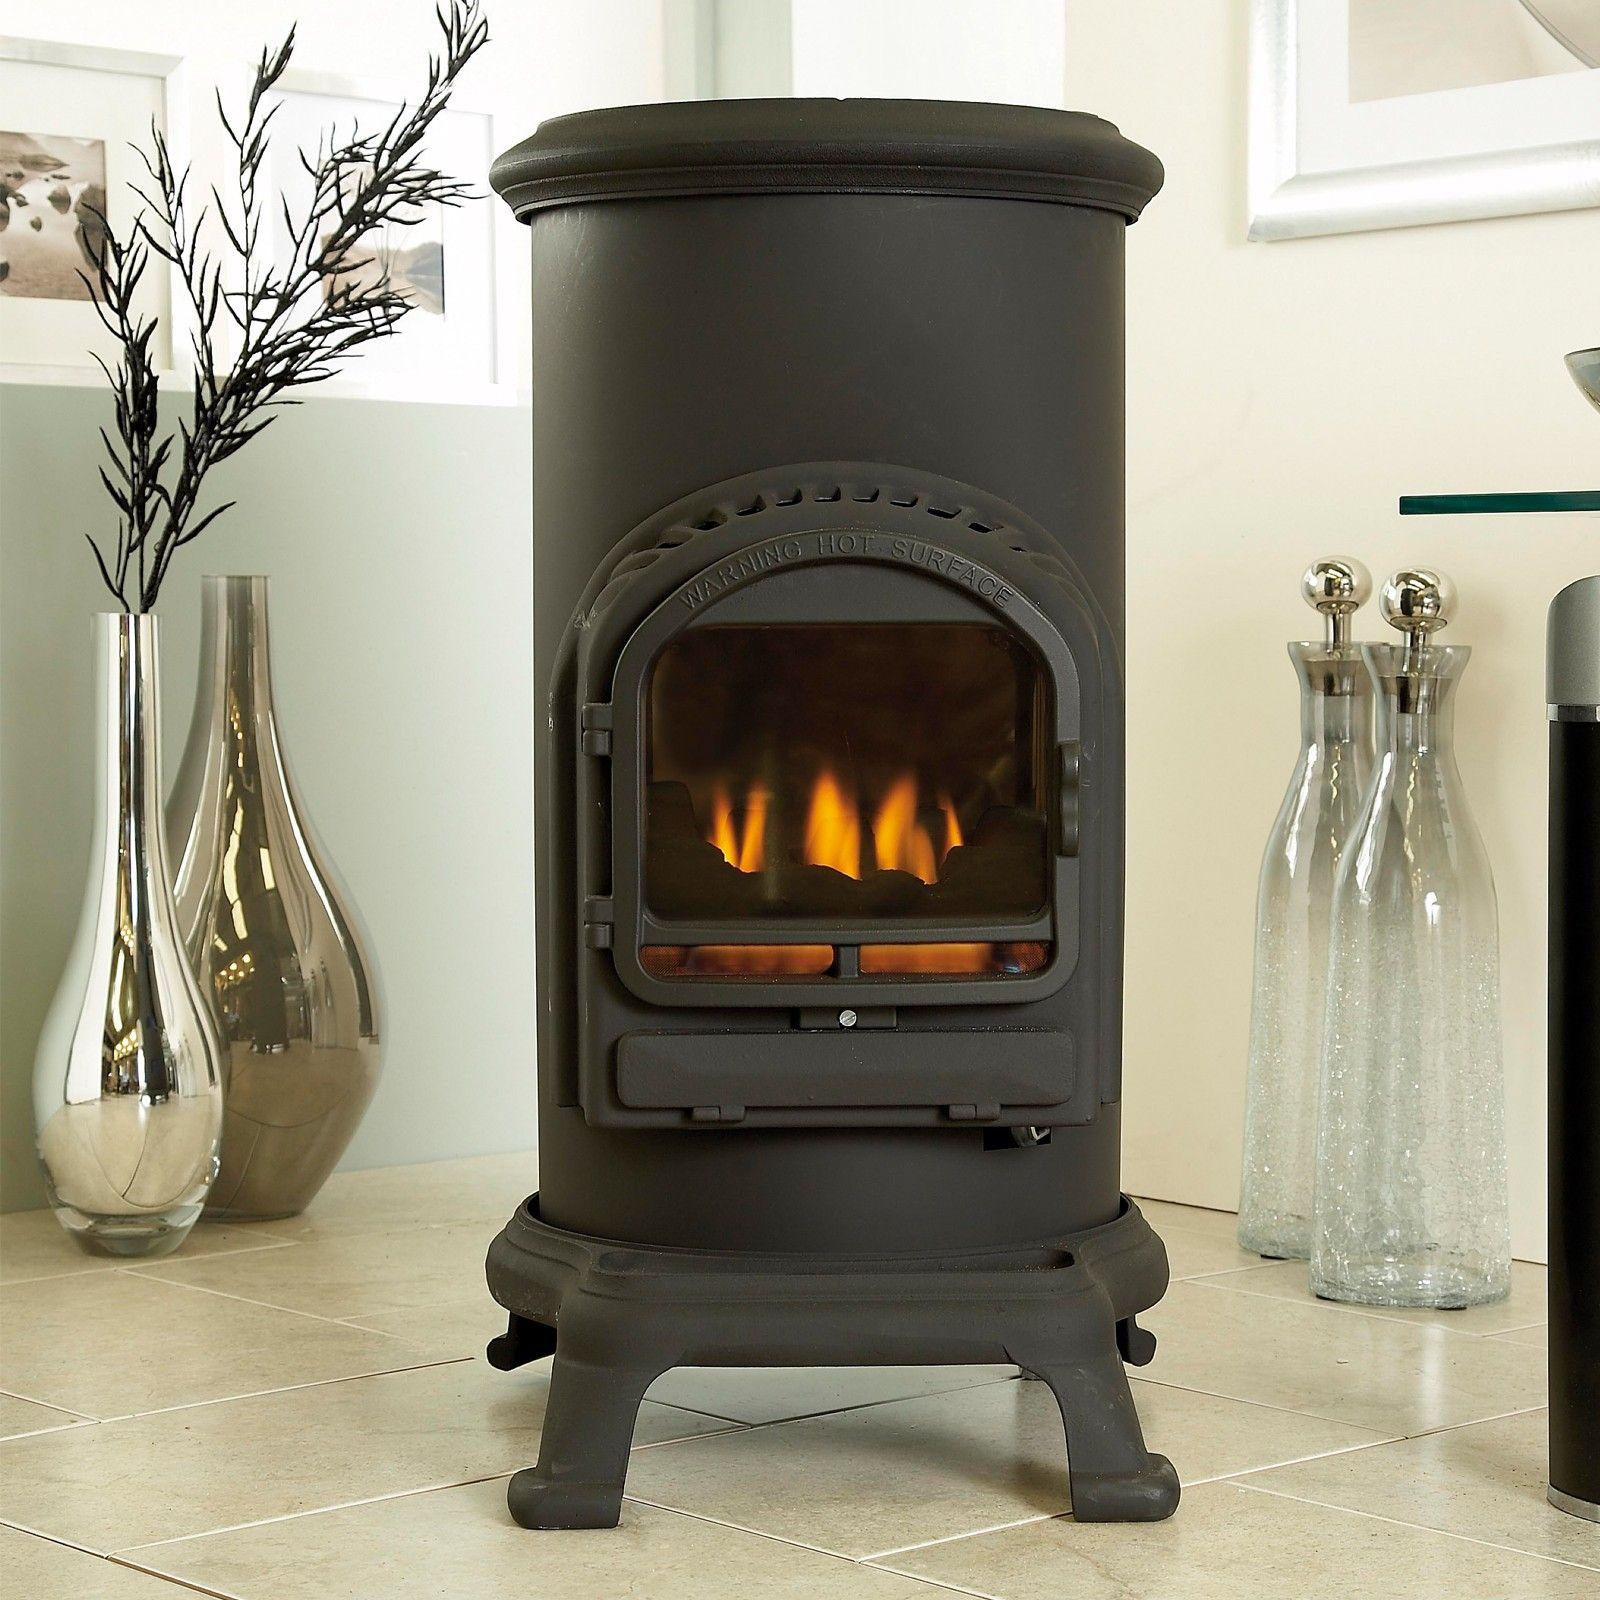 Portable Gas Fireplace Heater | Fireplace | Pinterest | Fireplace ...